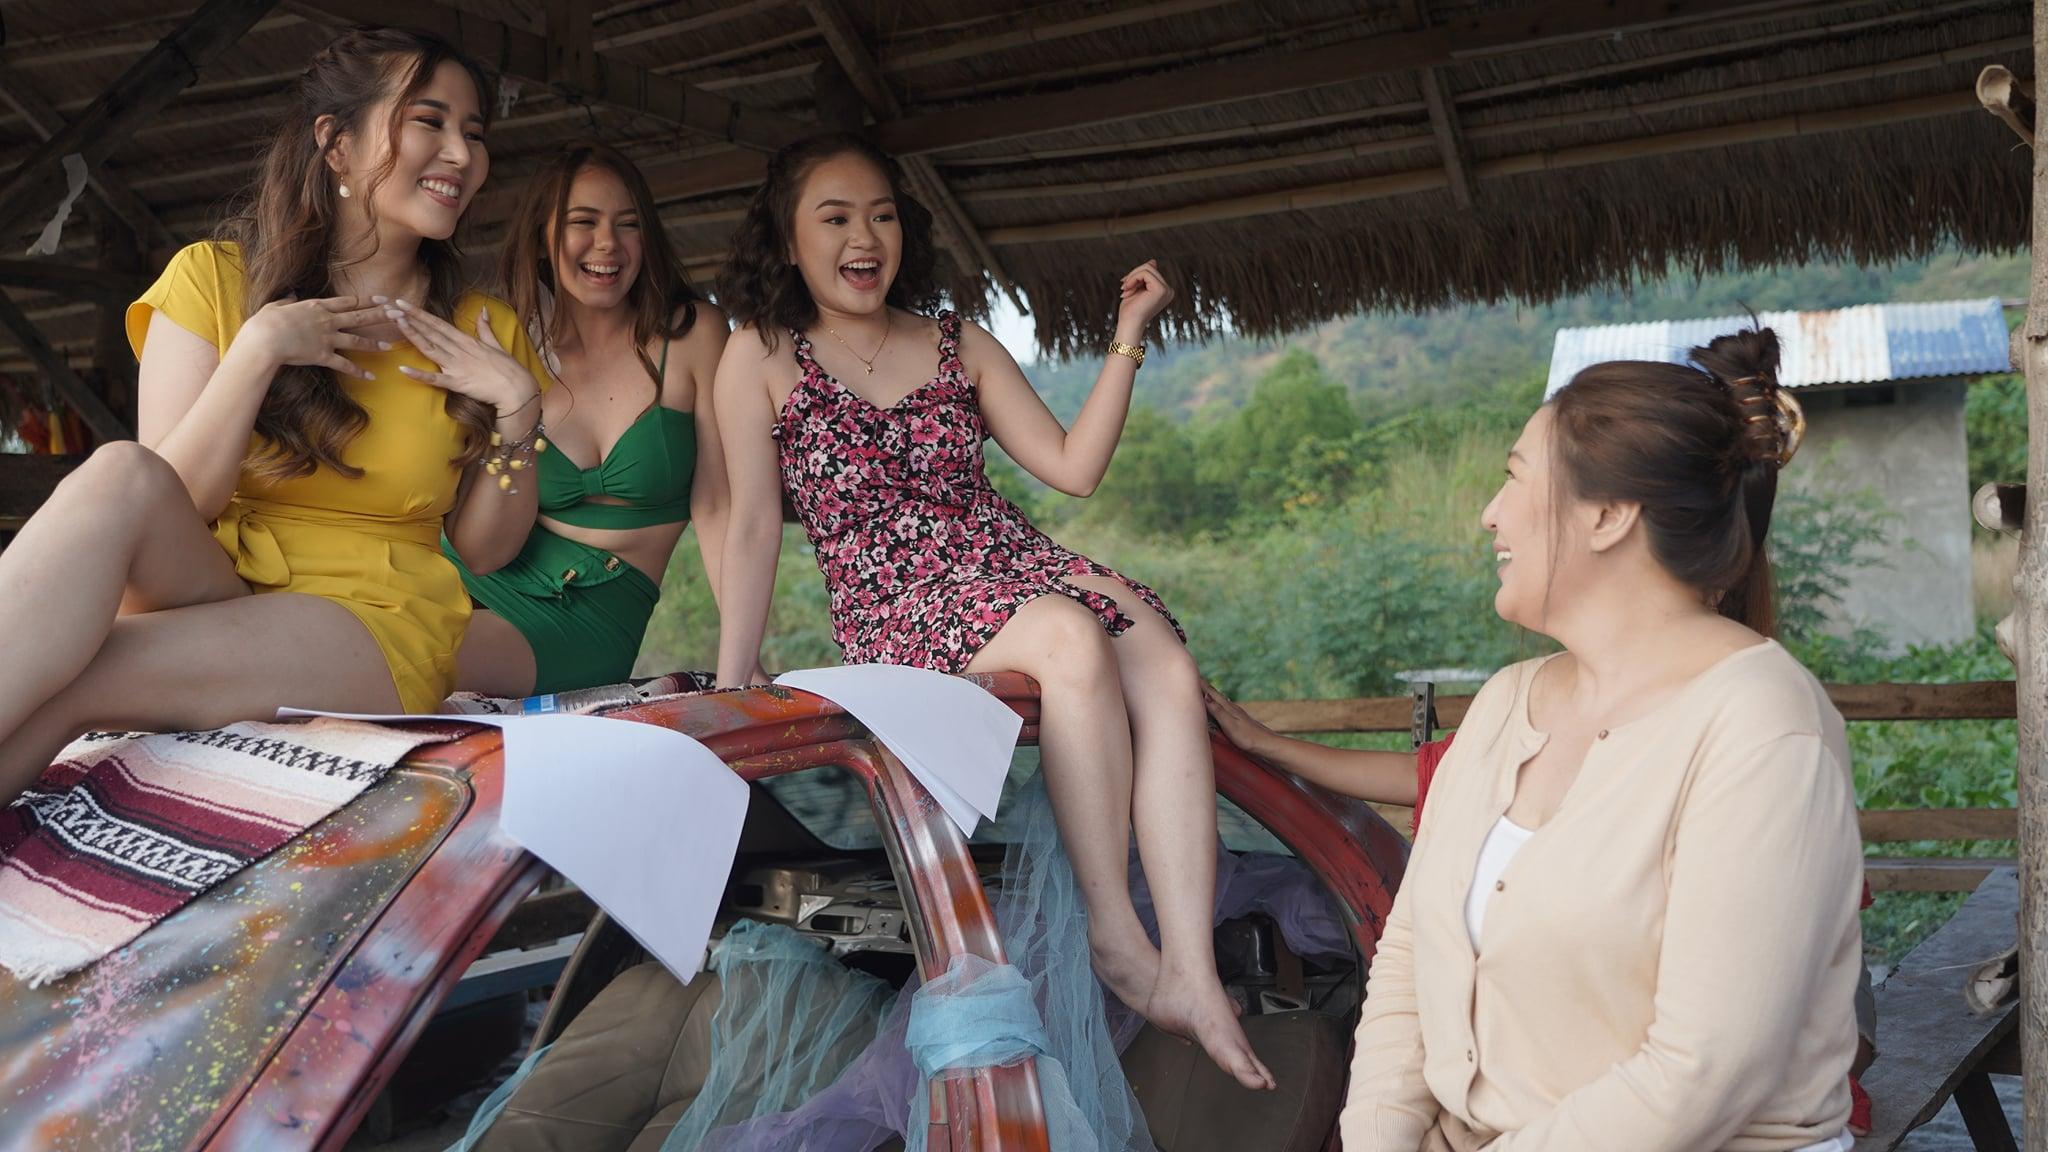 Sharon Cuneta, Abby Bautista, Rose Van Ginkel, and Marion Aunor in Revirginized (2021)